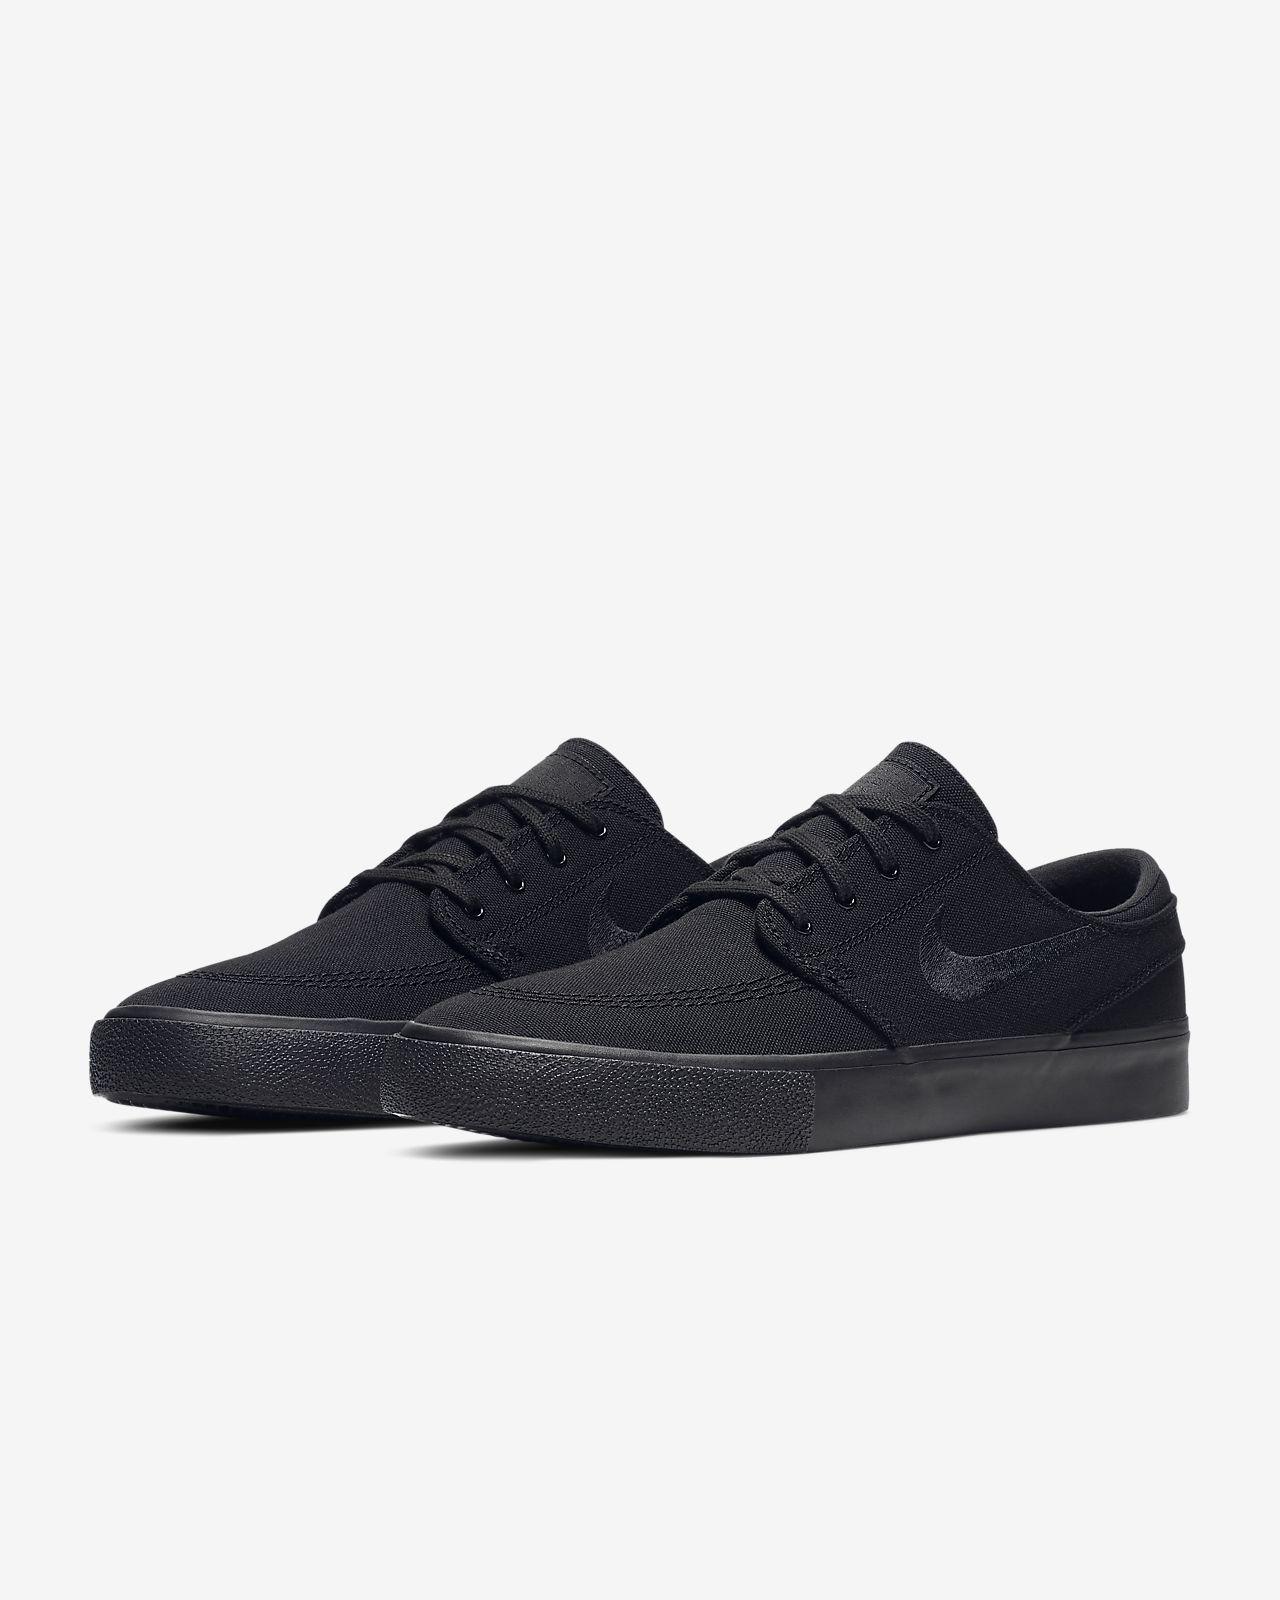 Nike SB Zoom Stefan Janoski Premium HT | Black | Skate shoes